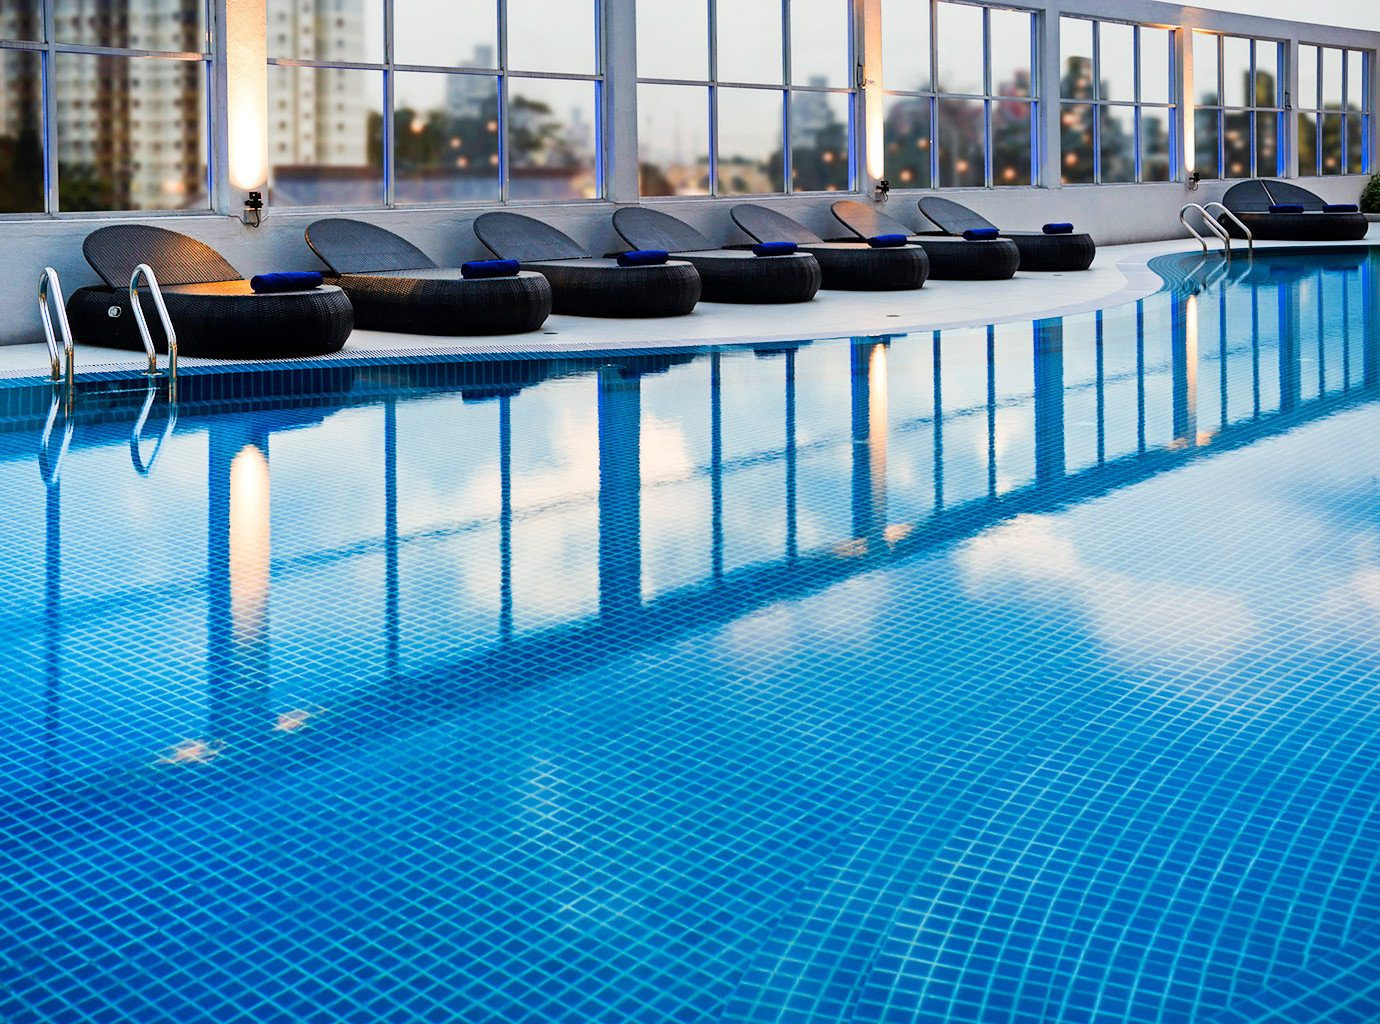 Business Modern Pool leisure swimming pool blue flooring lined